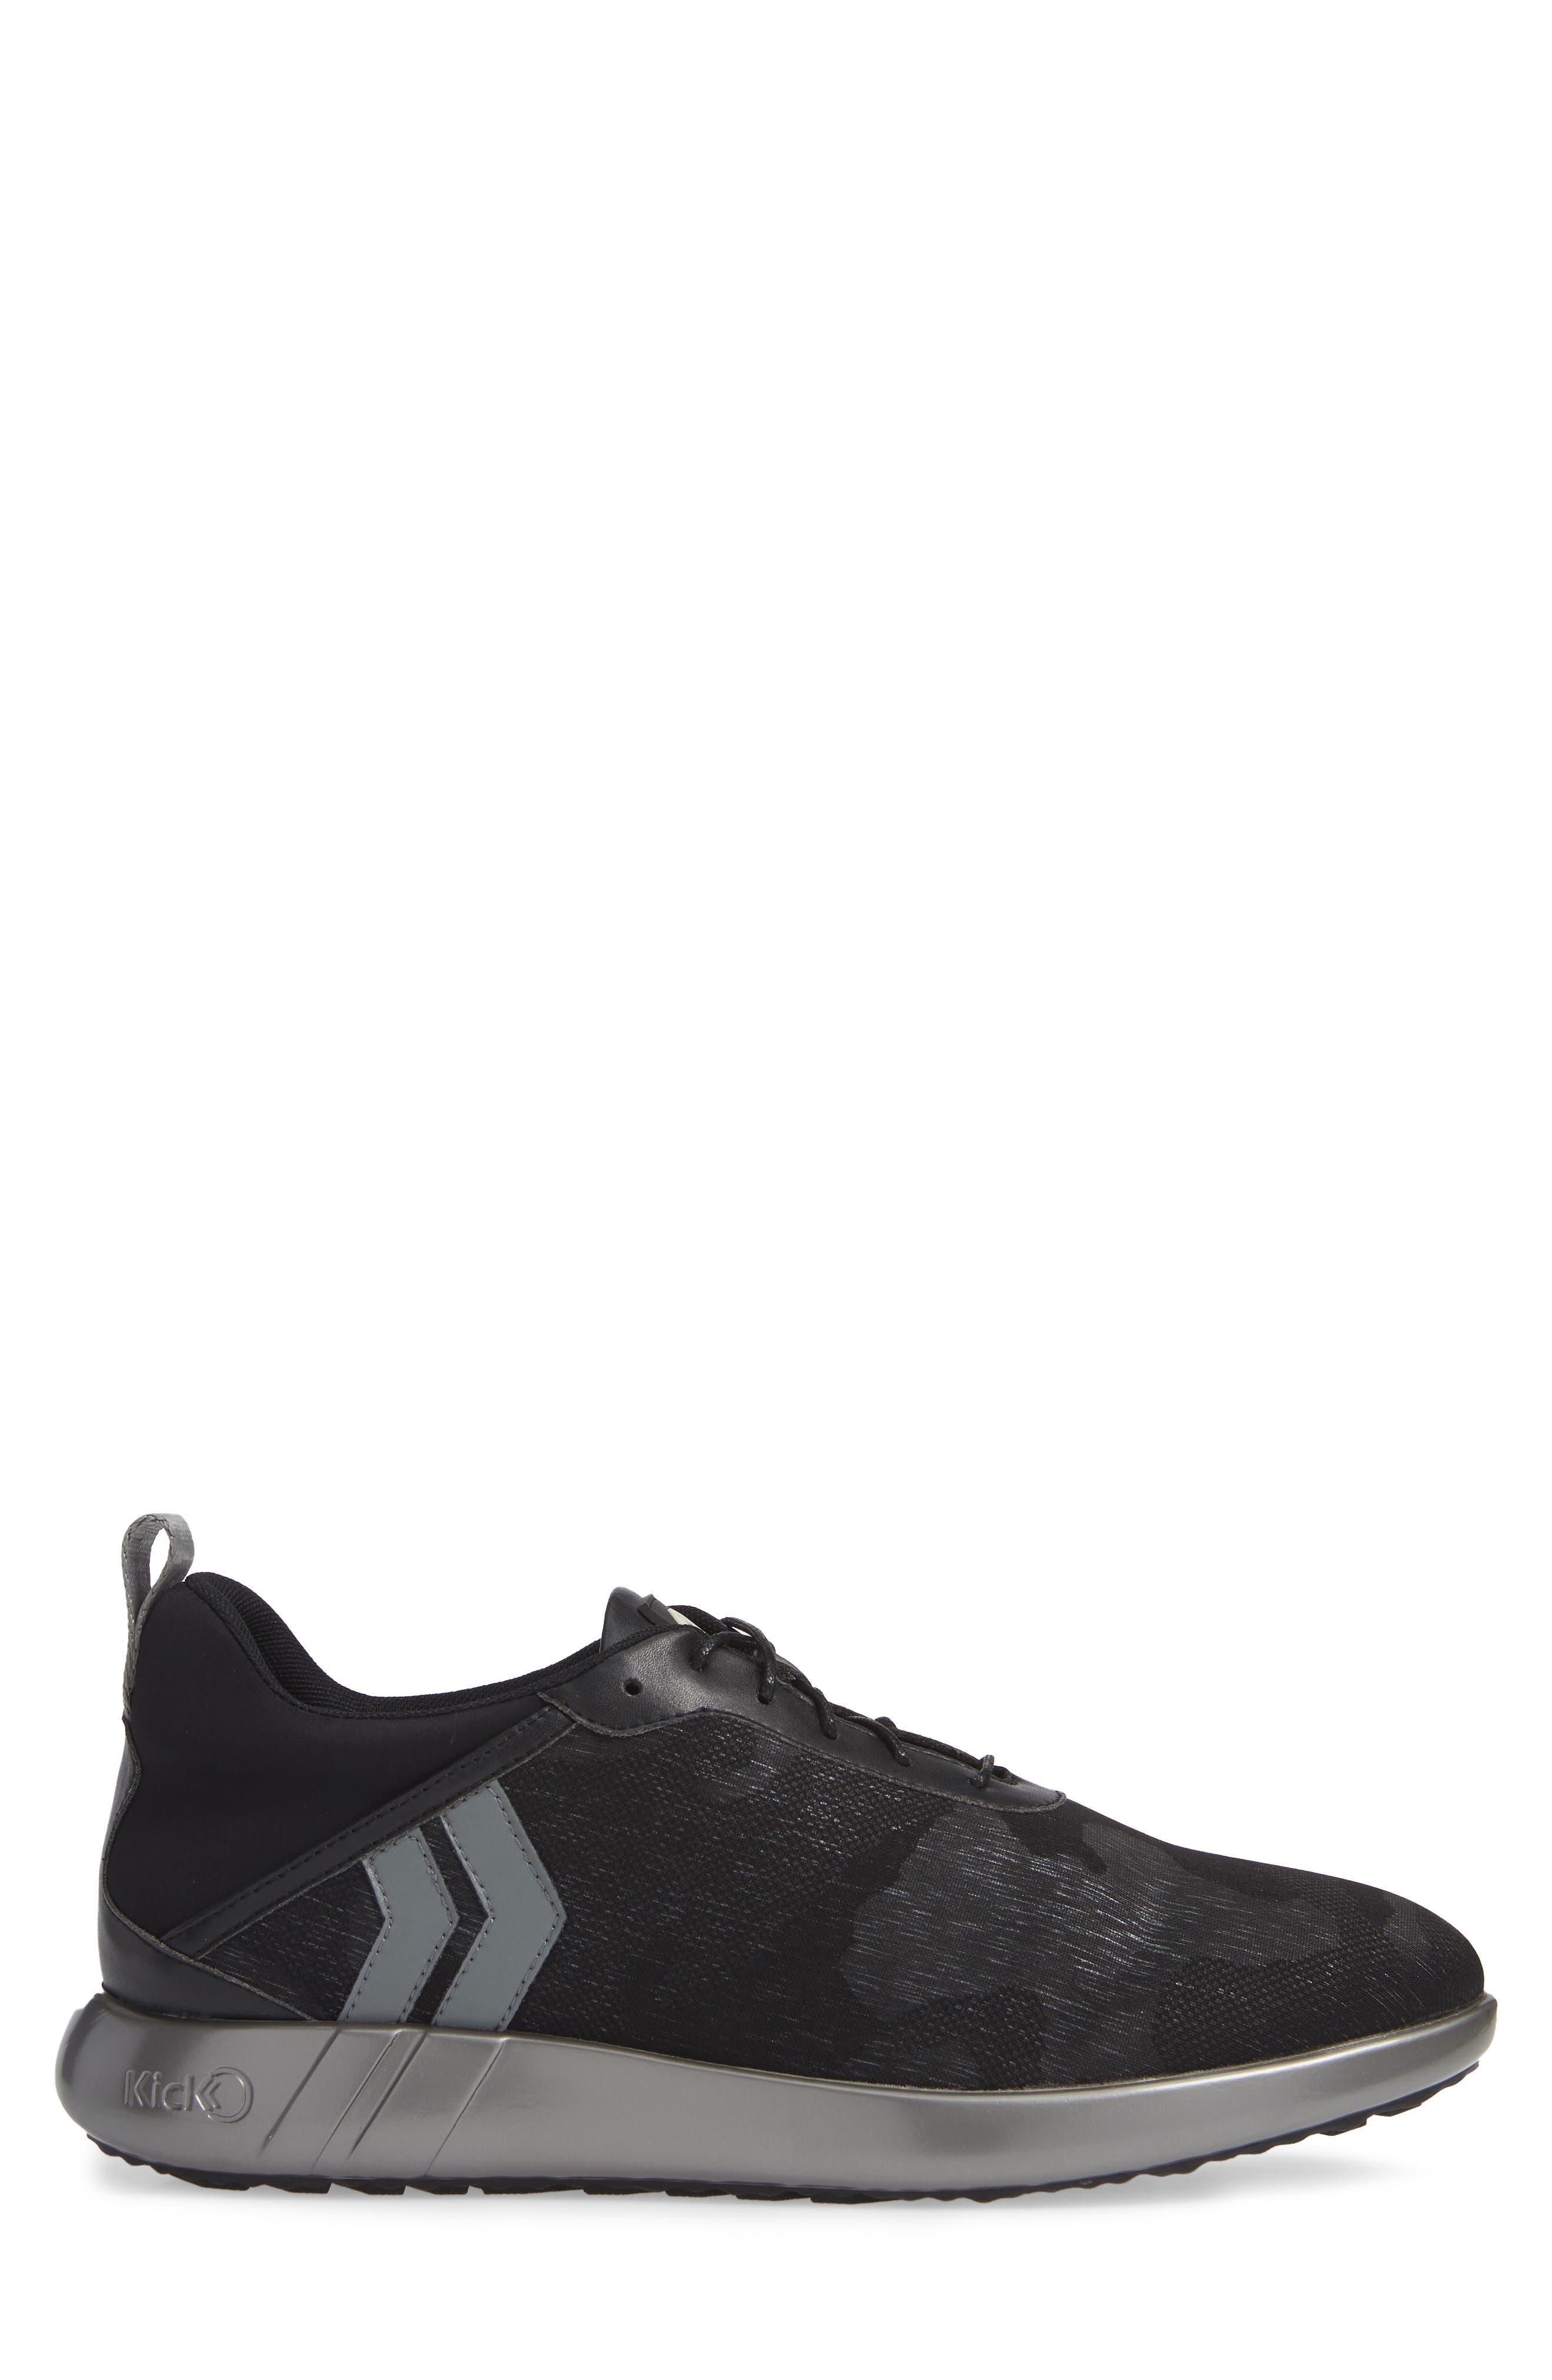 Haze Sneaker,                             Alternate thumbnail 3, color,                             021